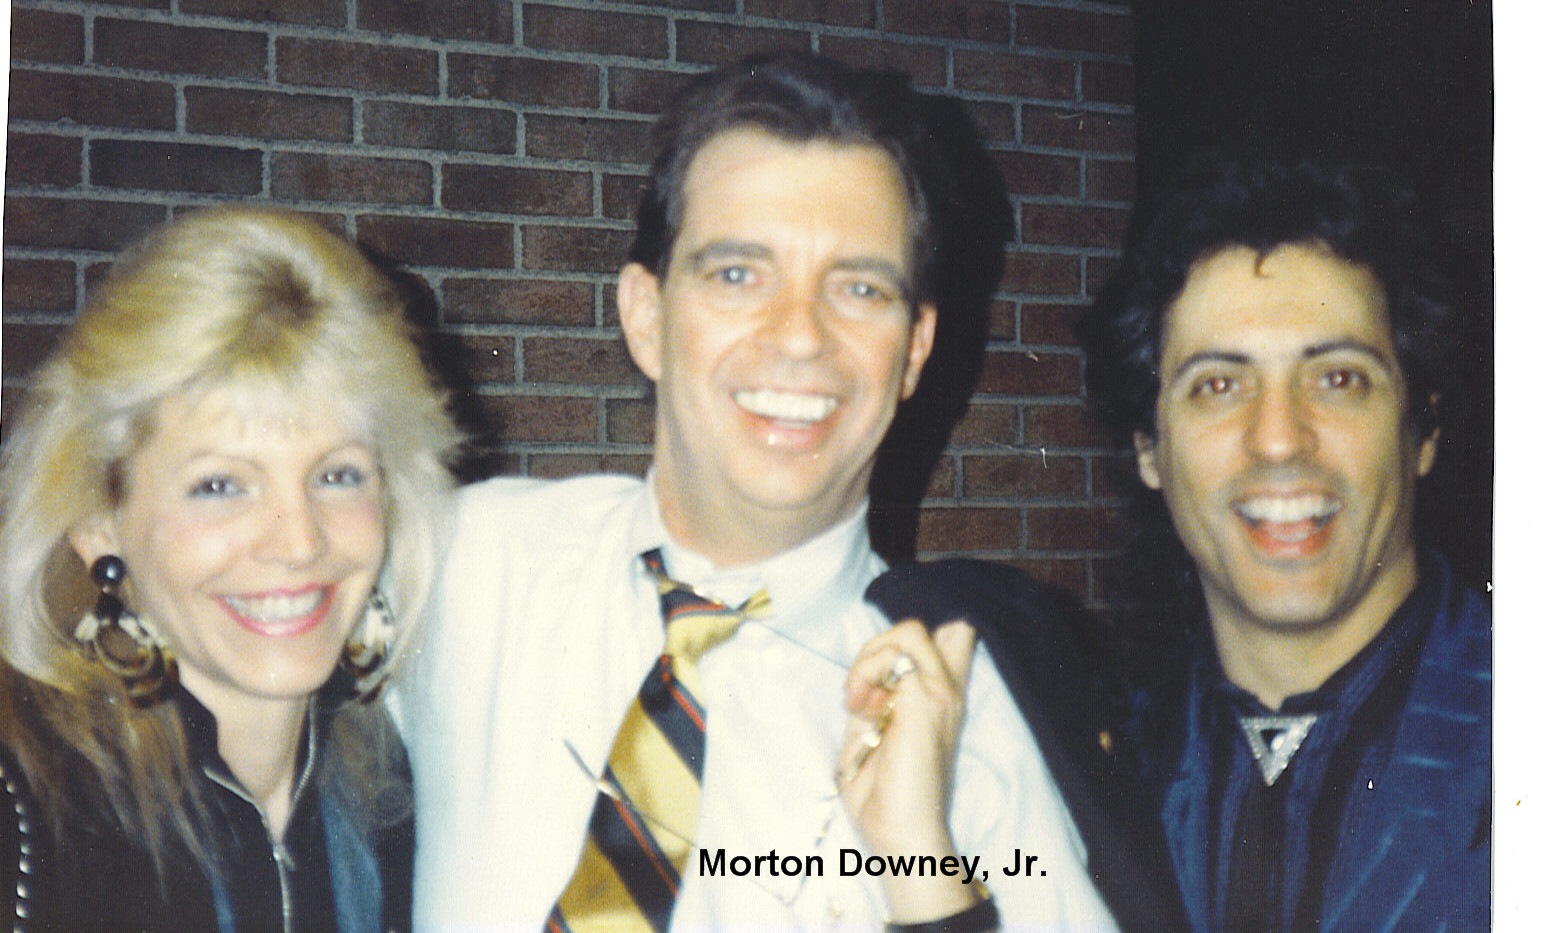 Morton Downey Jr.